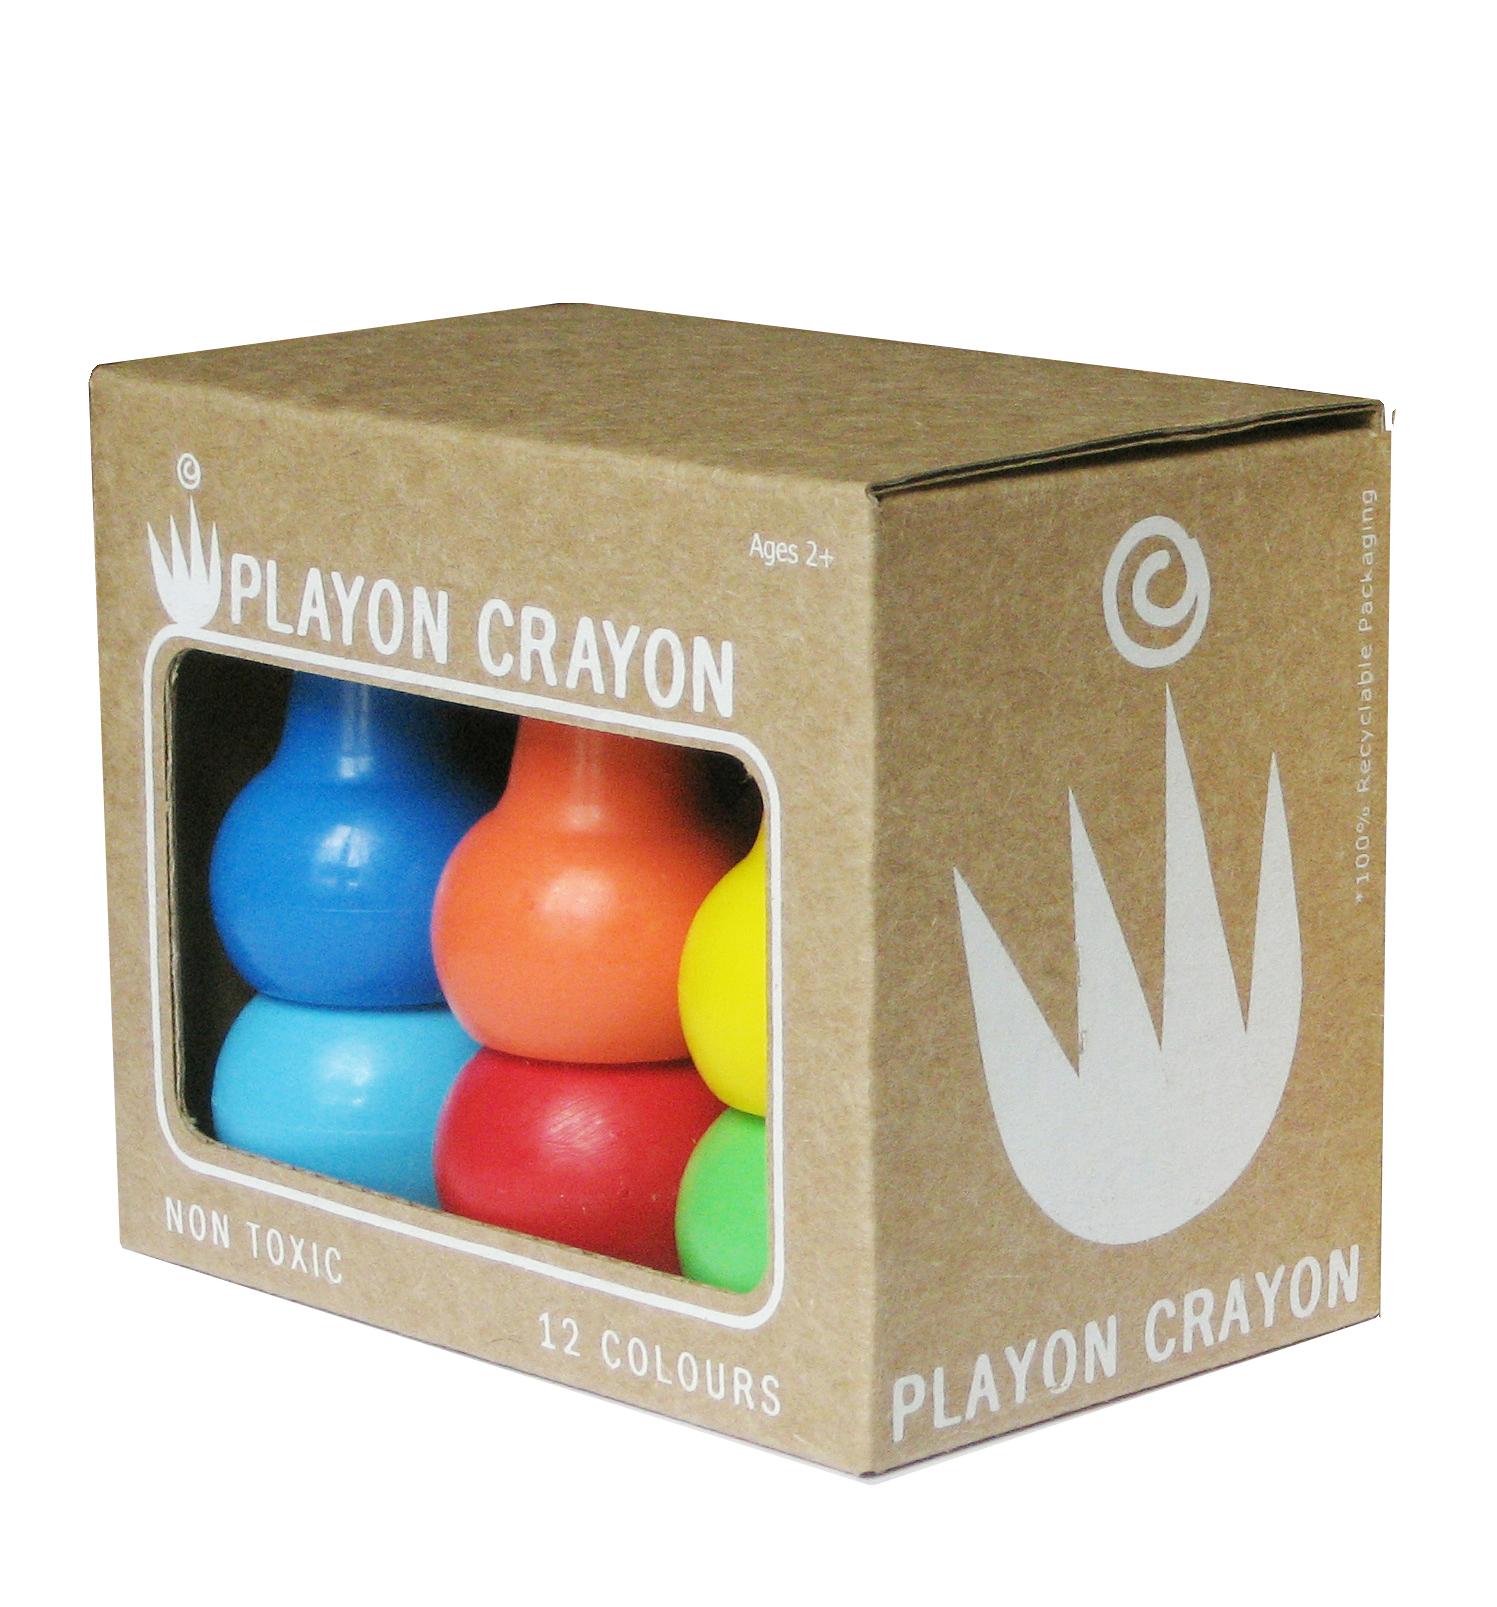 PLAYON CRAYON PRIMARY von STUDIO SKINKY